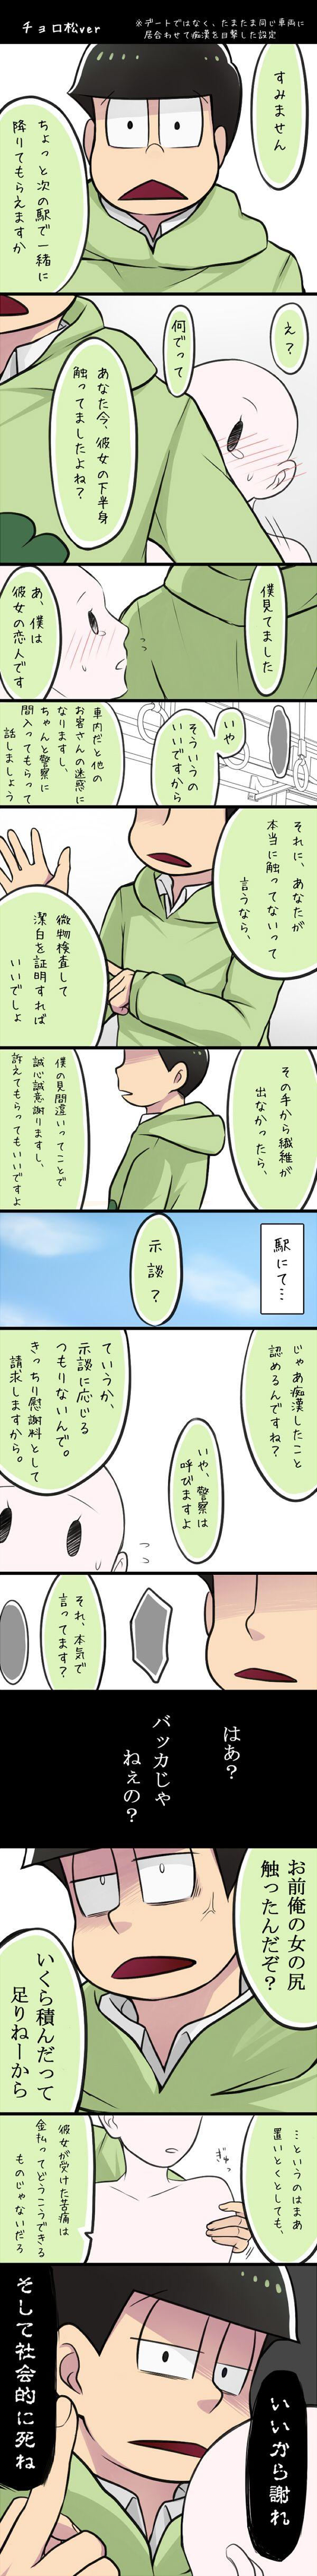 Osomatsu-san: Dealing with harassment (Choromatsu version)